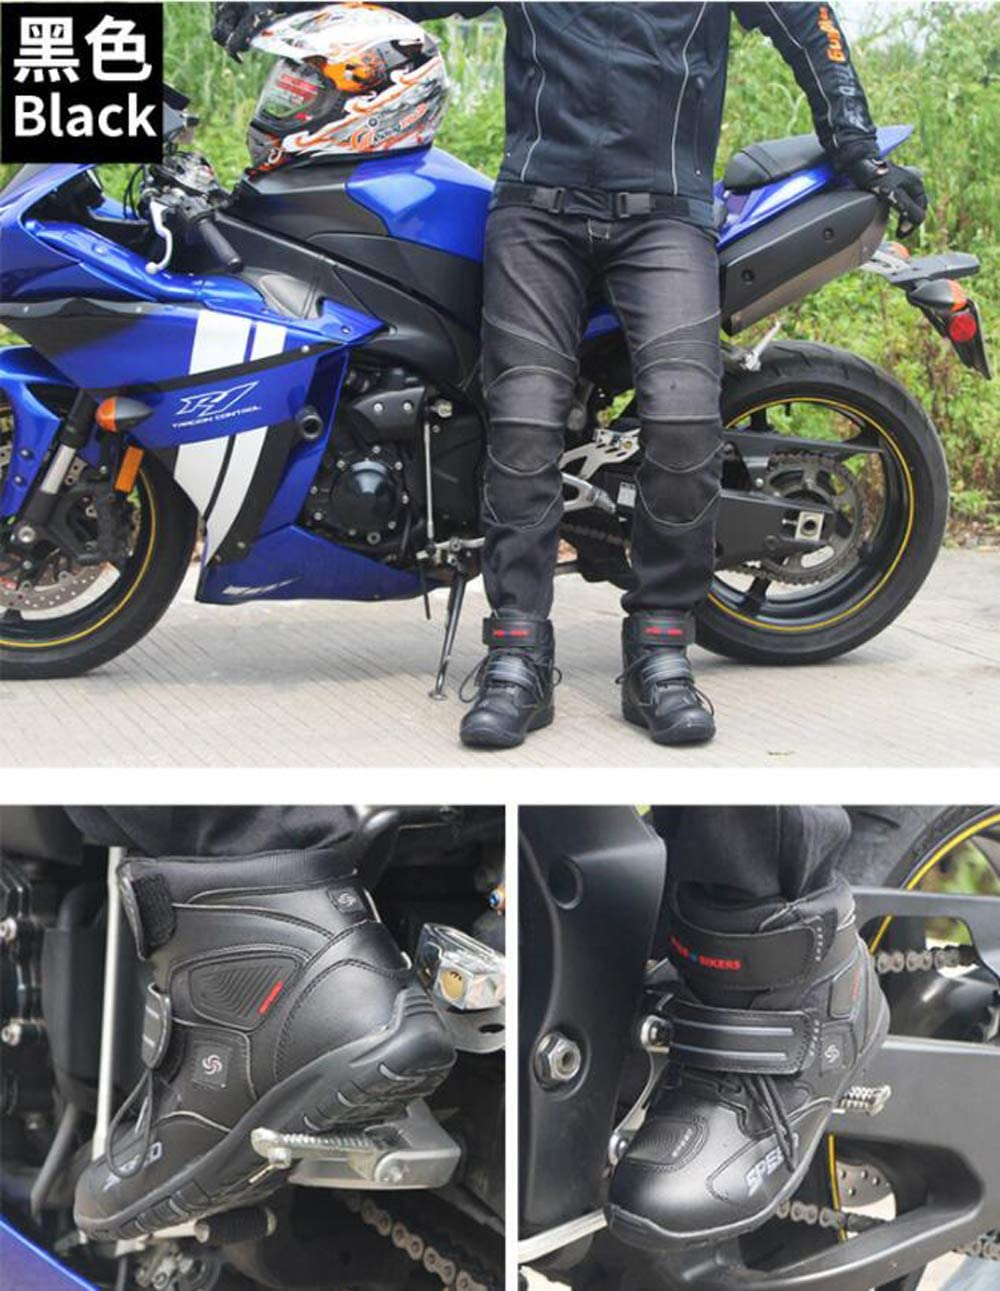 ZZKK Botas de Motos de Cuero a Prueba de Agua Botas de Motos de Carreras Profesionales Motos de Carretera